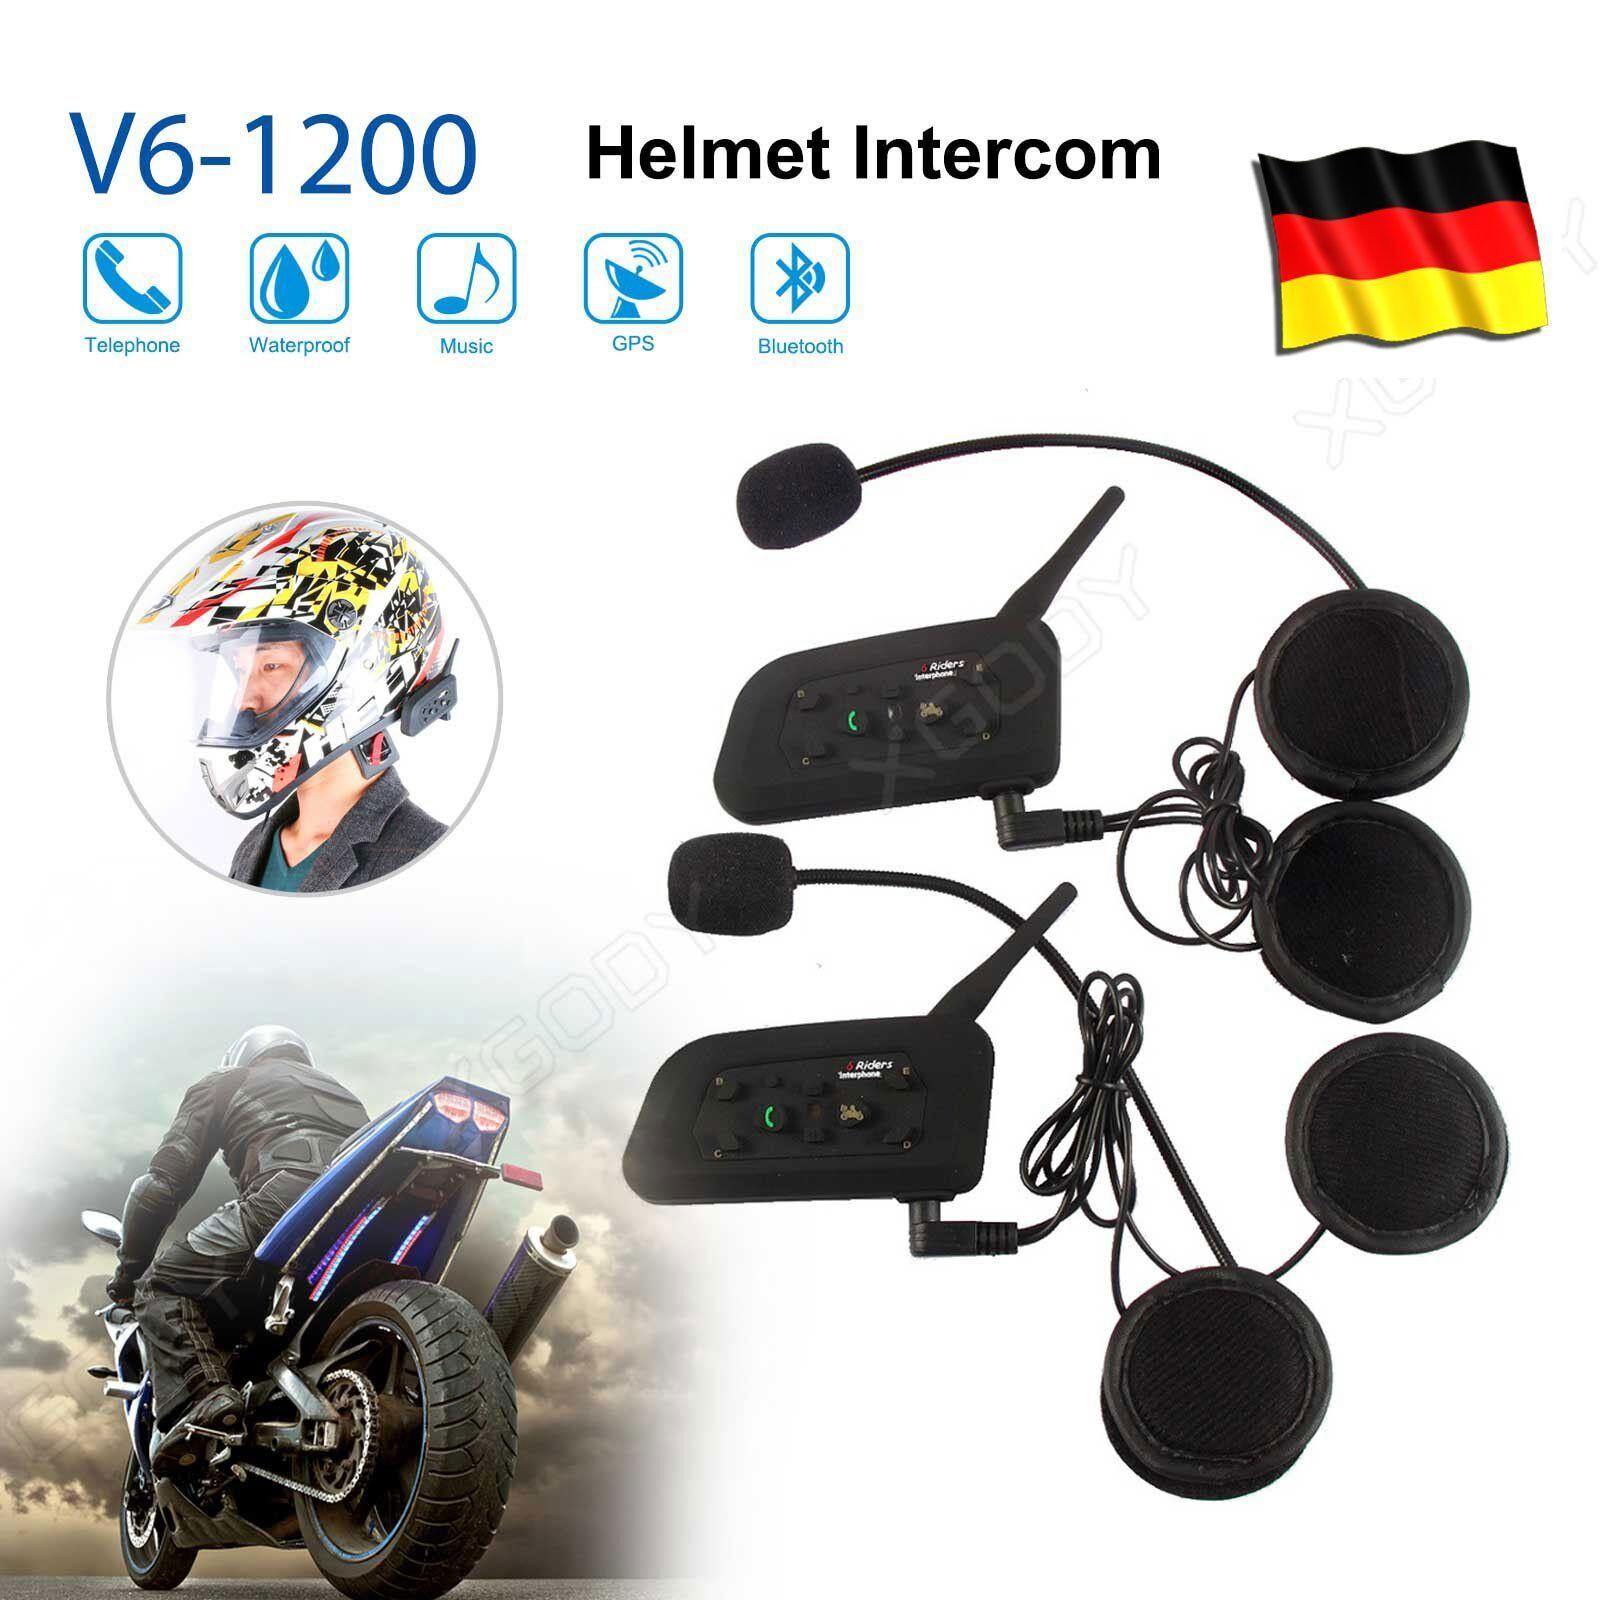 1,2 km Bluetooth Motorrad Intercom Headset Helm Gegensprechanlage Intercom V8